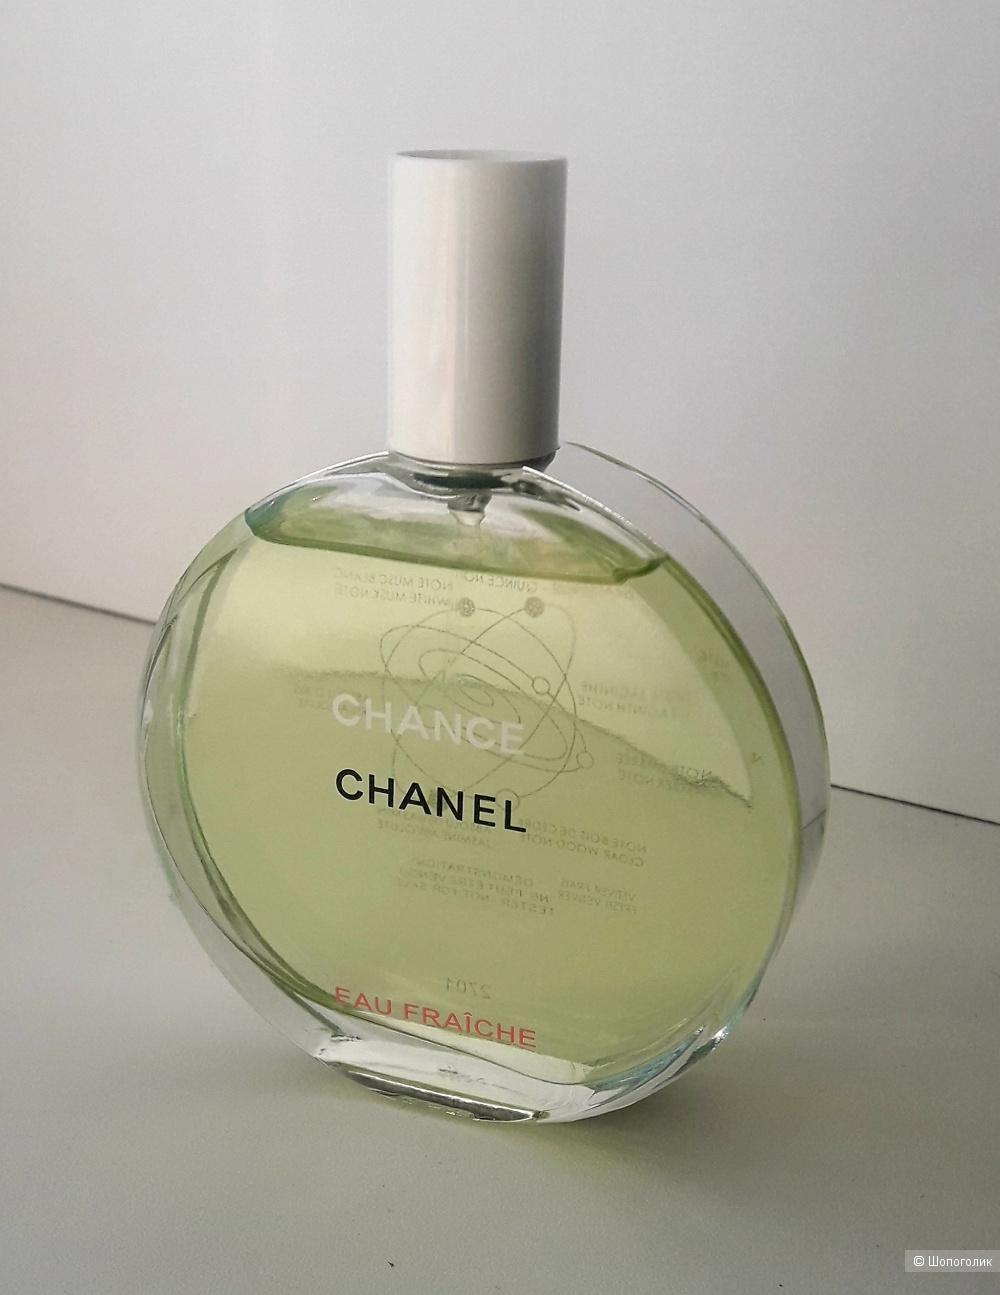 CHANEL SHANS тестер, оригинал 100 мл.